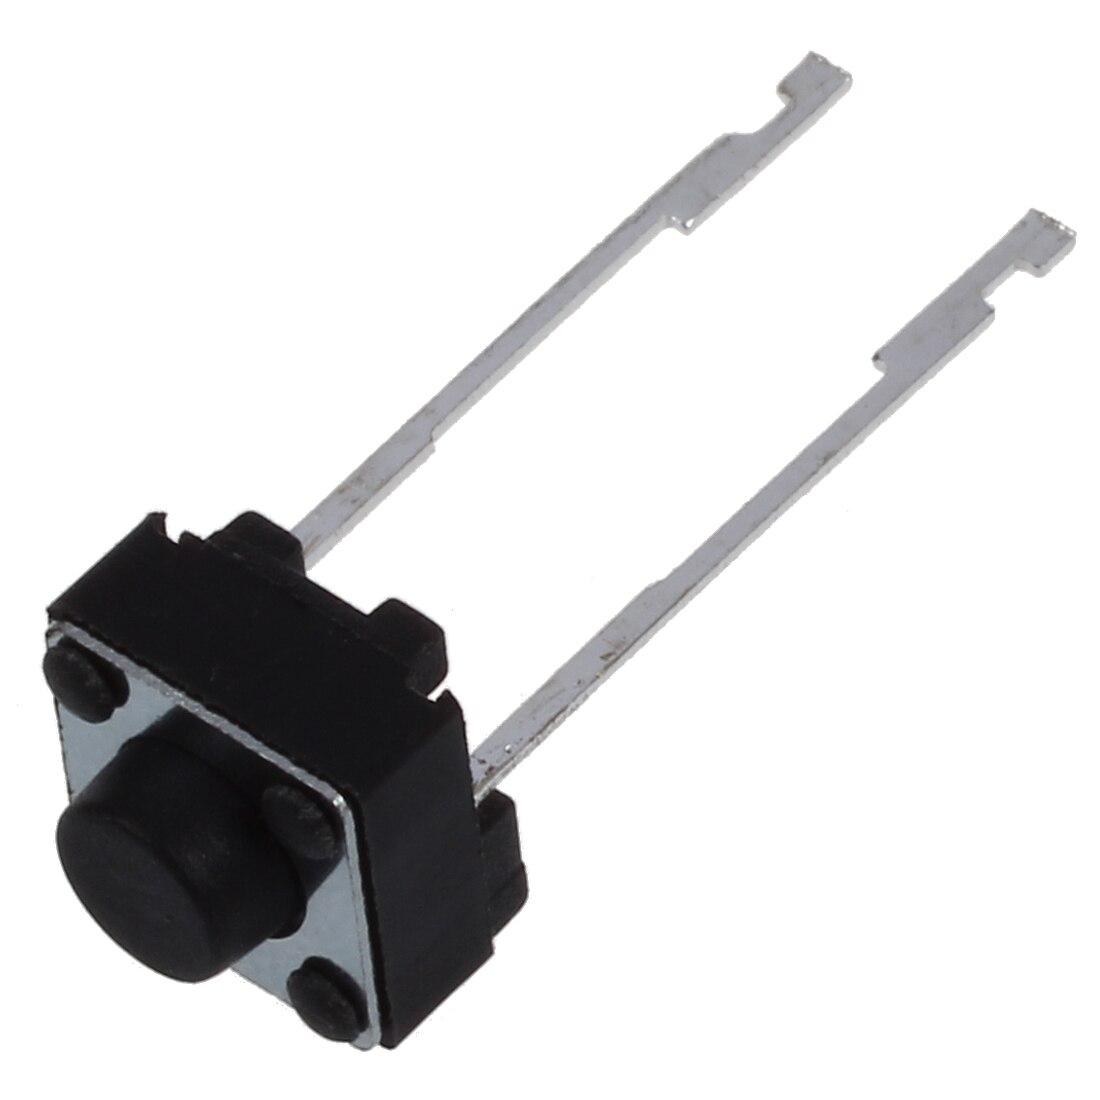 KSOL 20 Pcs 6x6x4mm Momentary Tactile Push Button Switch 2 Pin DIP Through